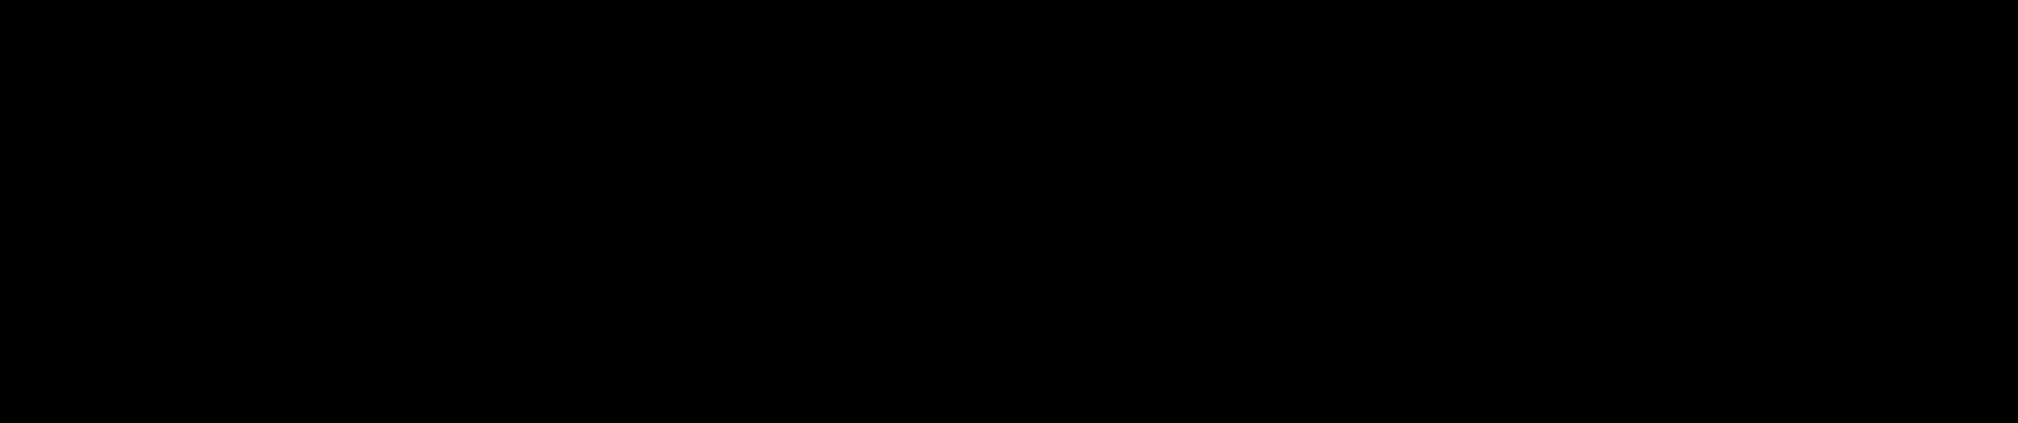 Corporate Sponsor - IN8 Developments Inc. - Logo